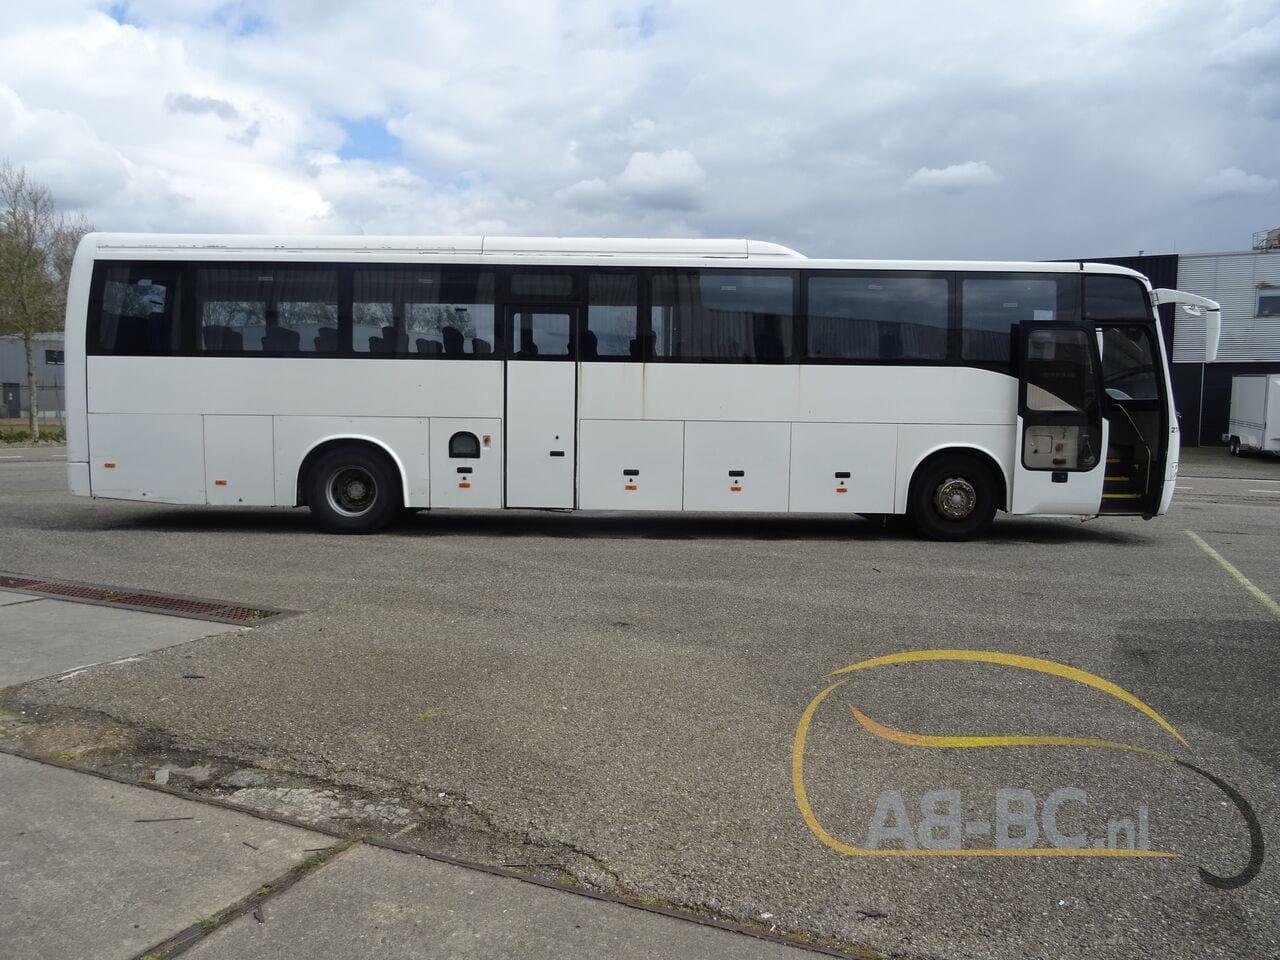 coach-busTEMSA-Safari-RD-65-Seats---1620311669118919363_big_b1a7e00fcd67bef6e7ccdab2a61c4353--21050617272795316700